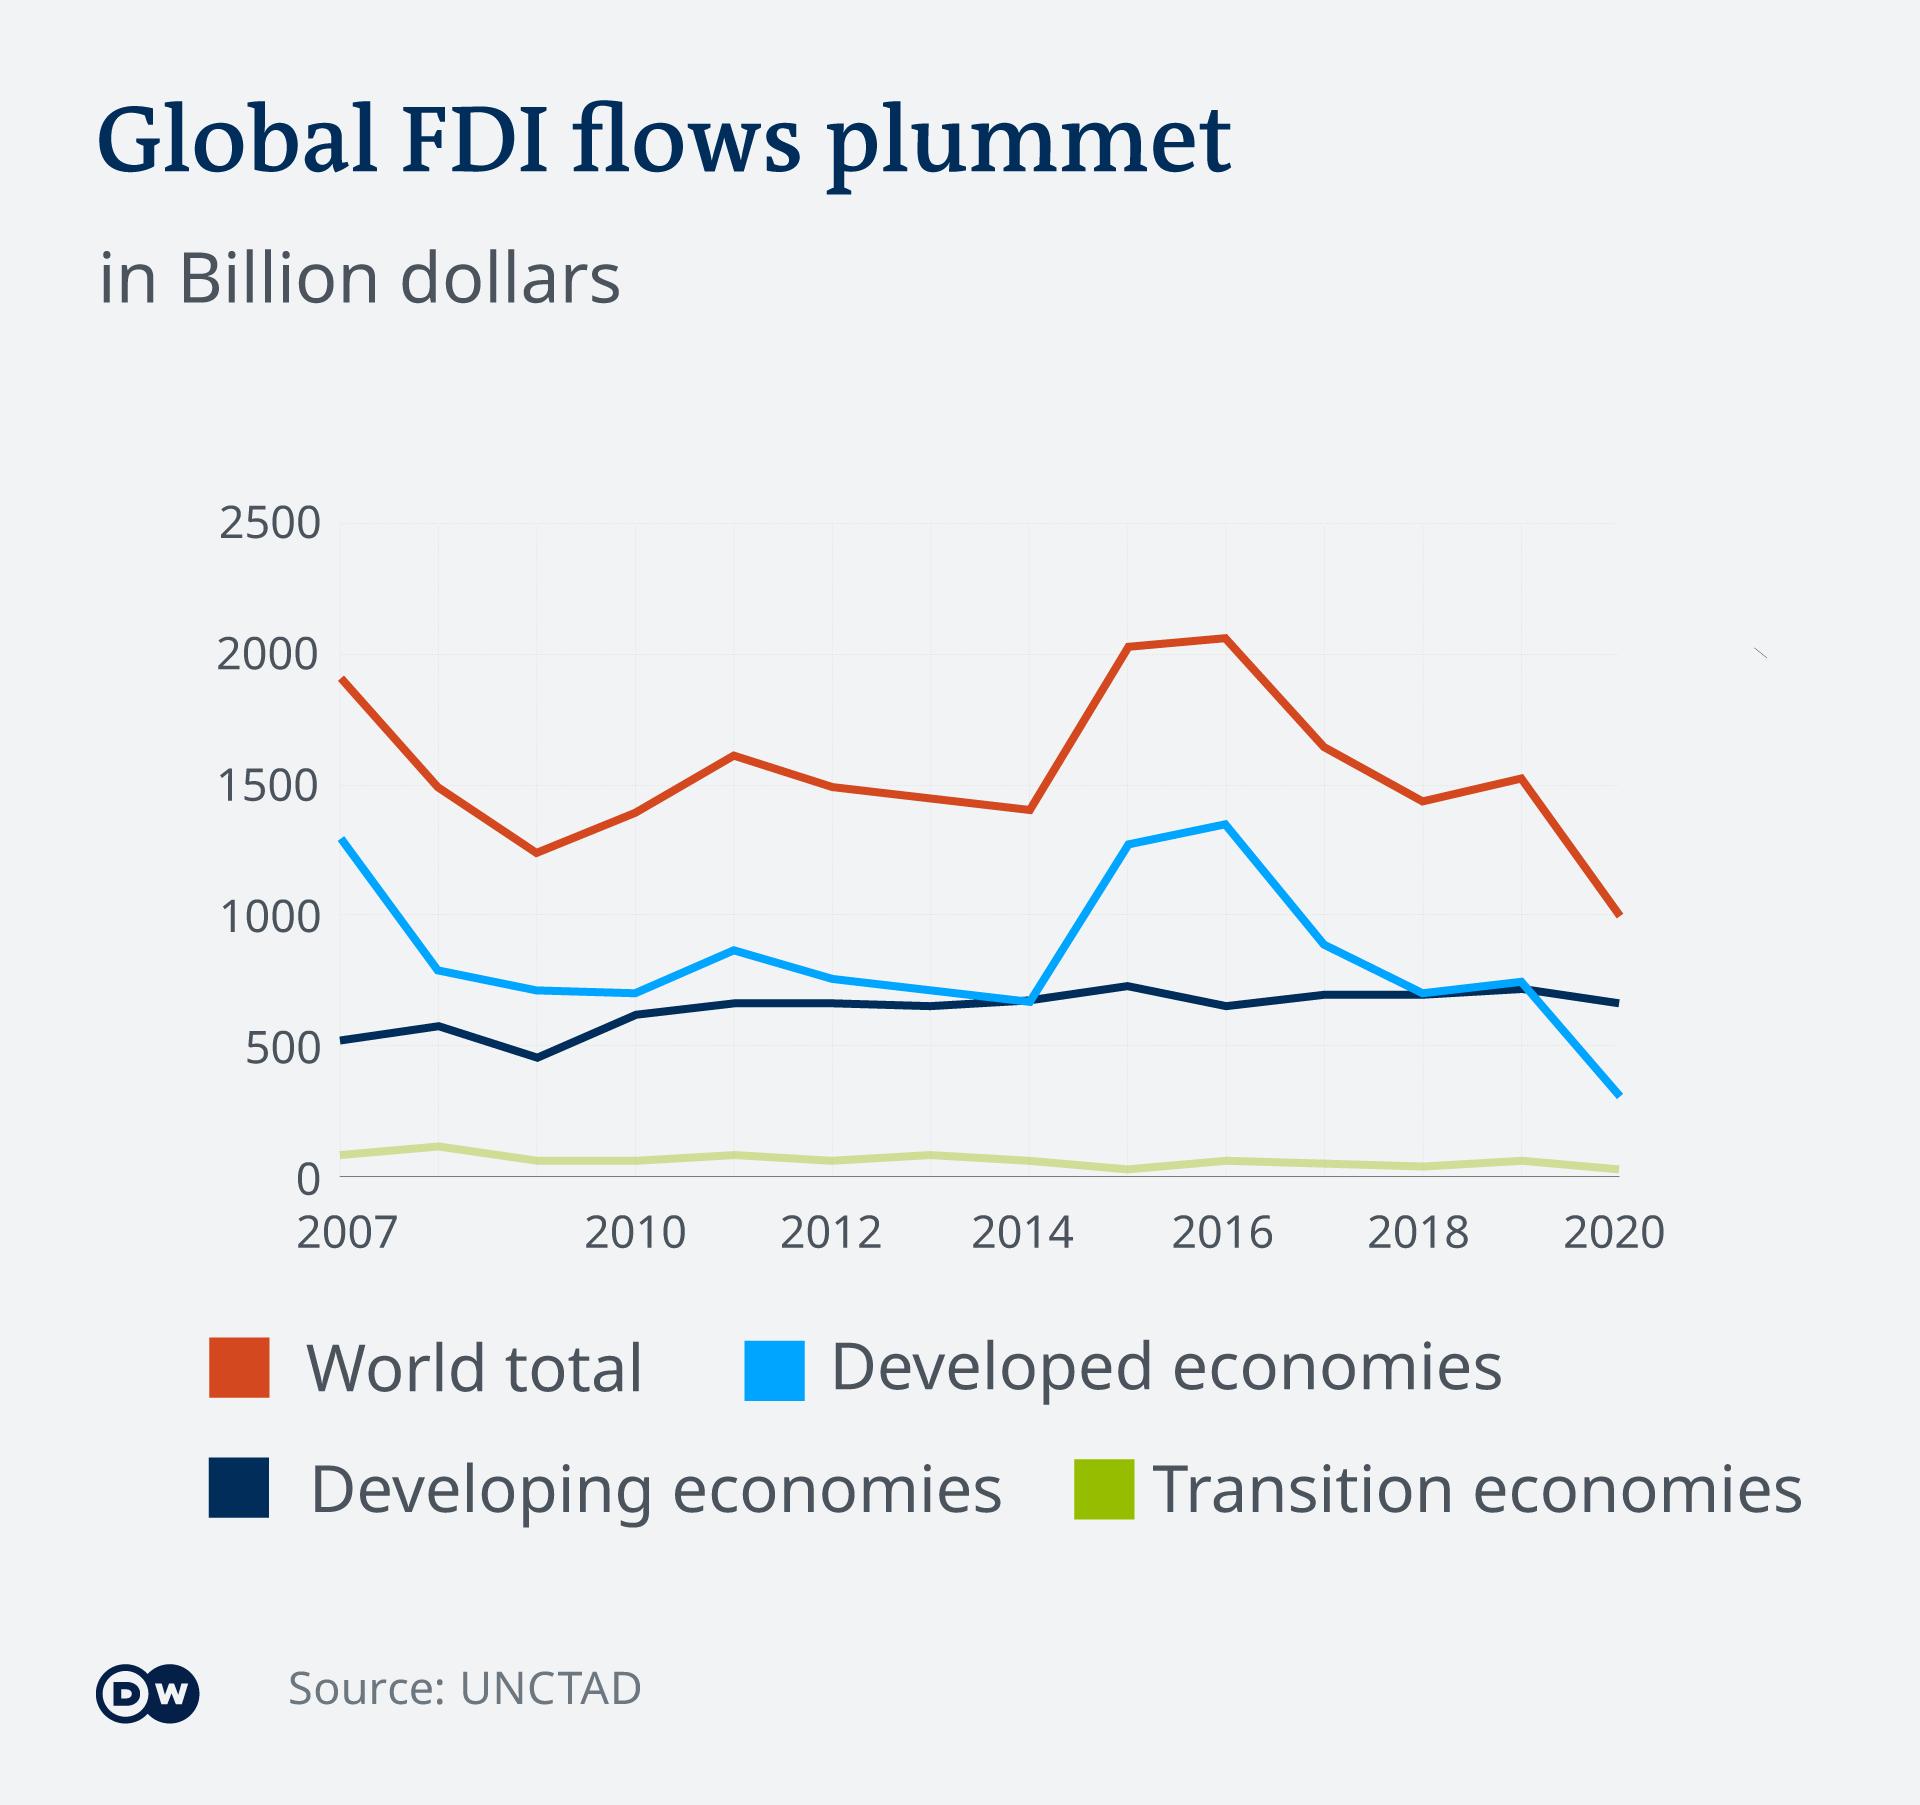 Global FDI flows